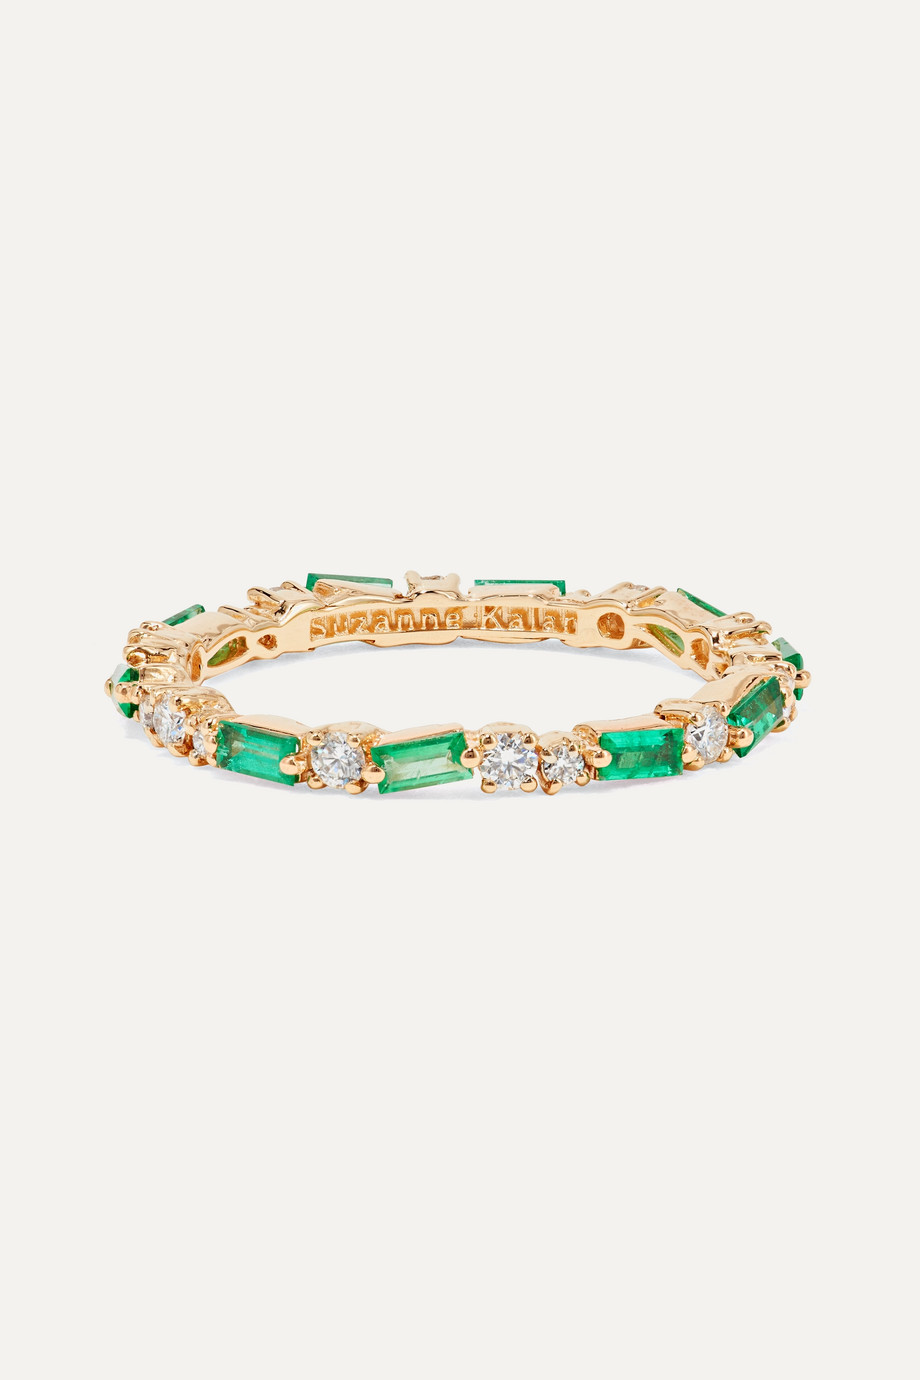 Suzanne Kalan 18-karat gold, emerald and diamond ring